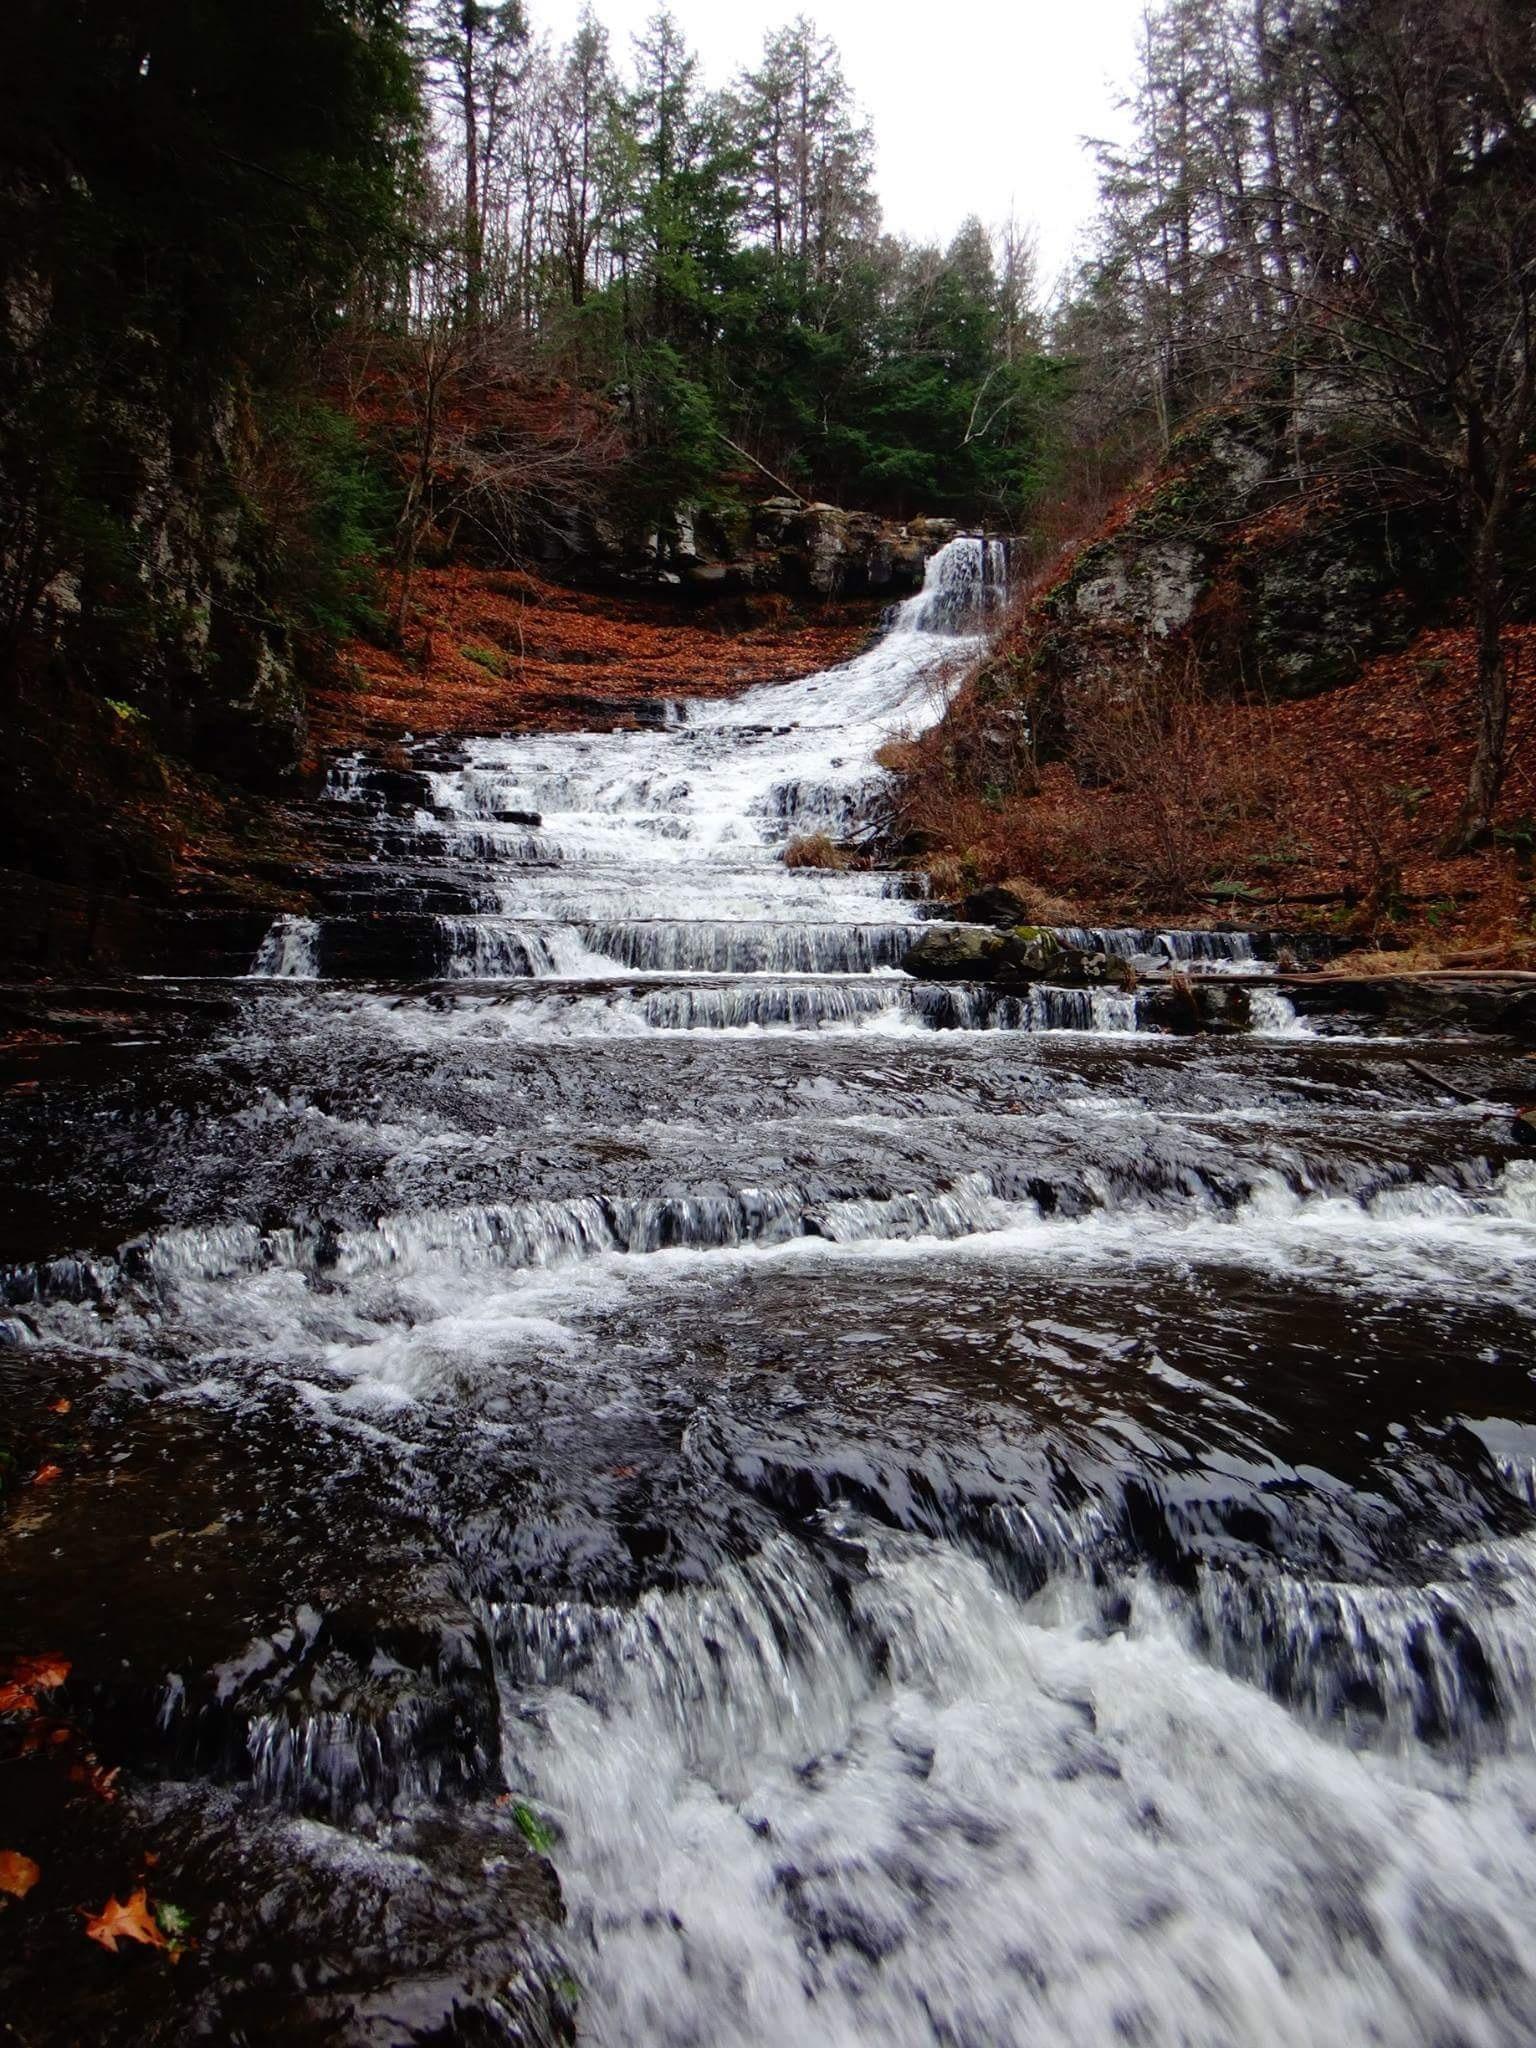 Tenmile Creek, Rensselaerville, New York, United States of America